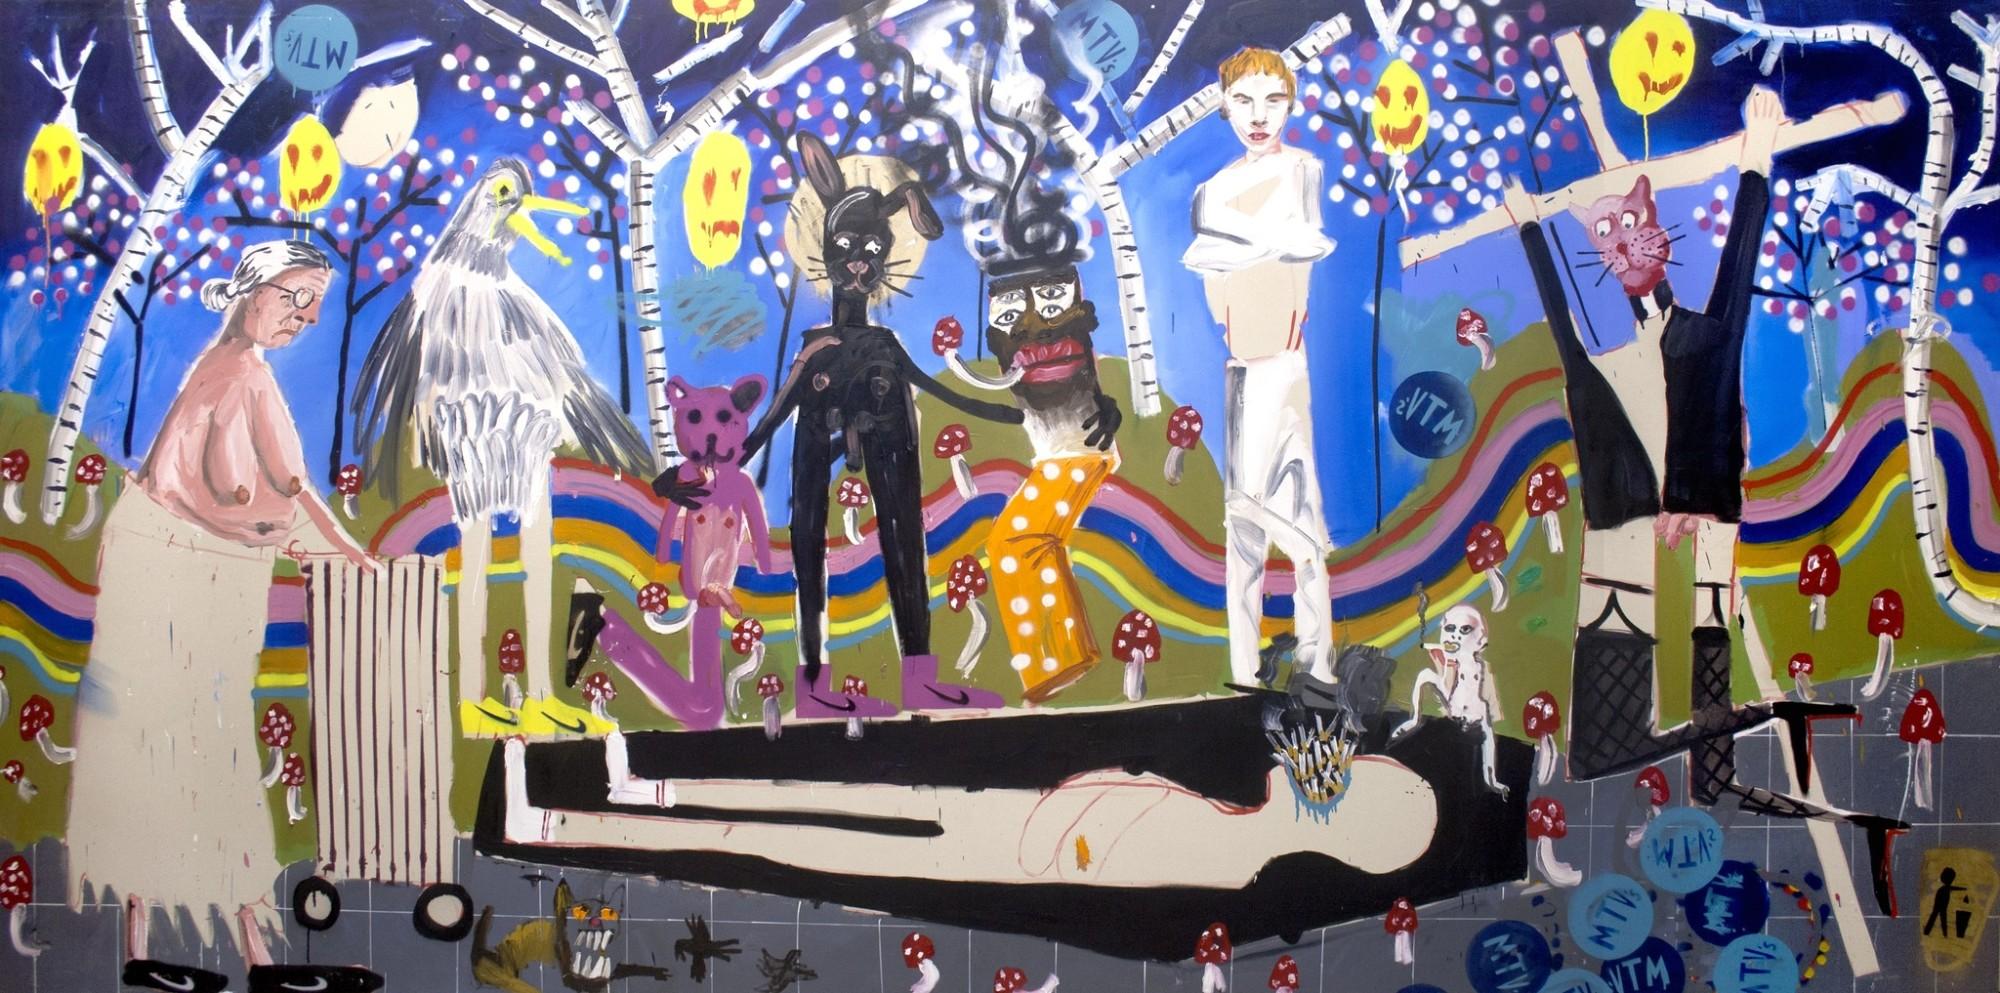 Acid Man's Funeral